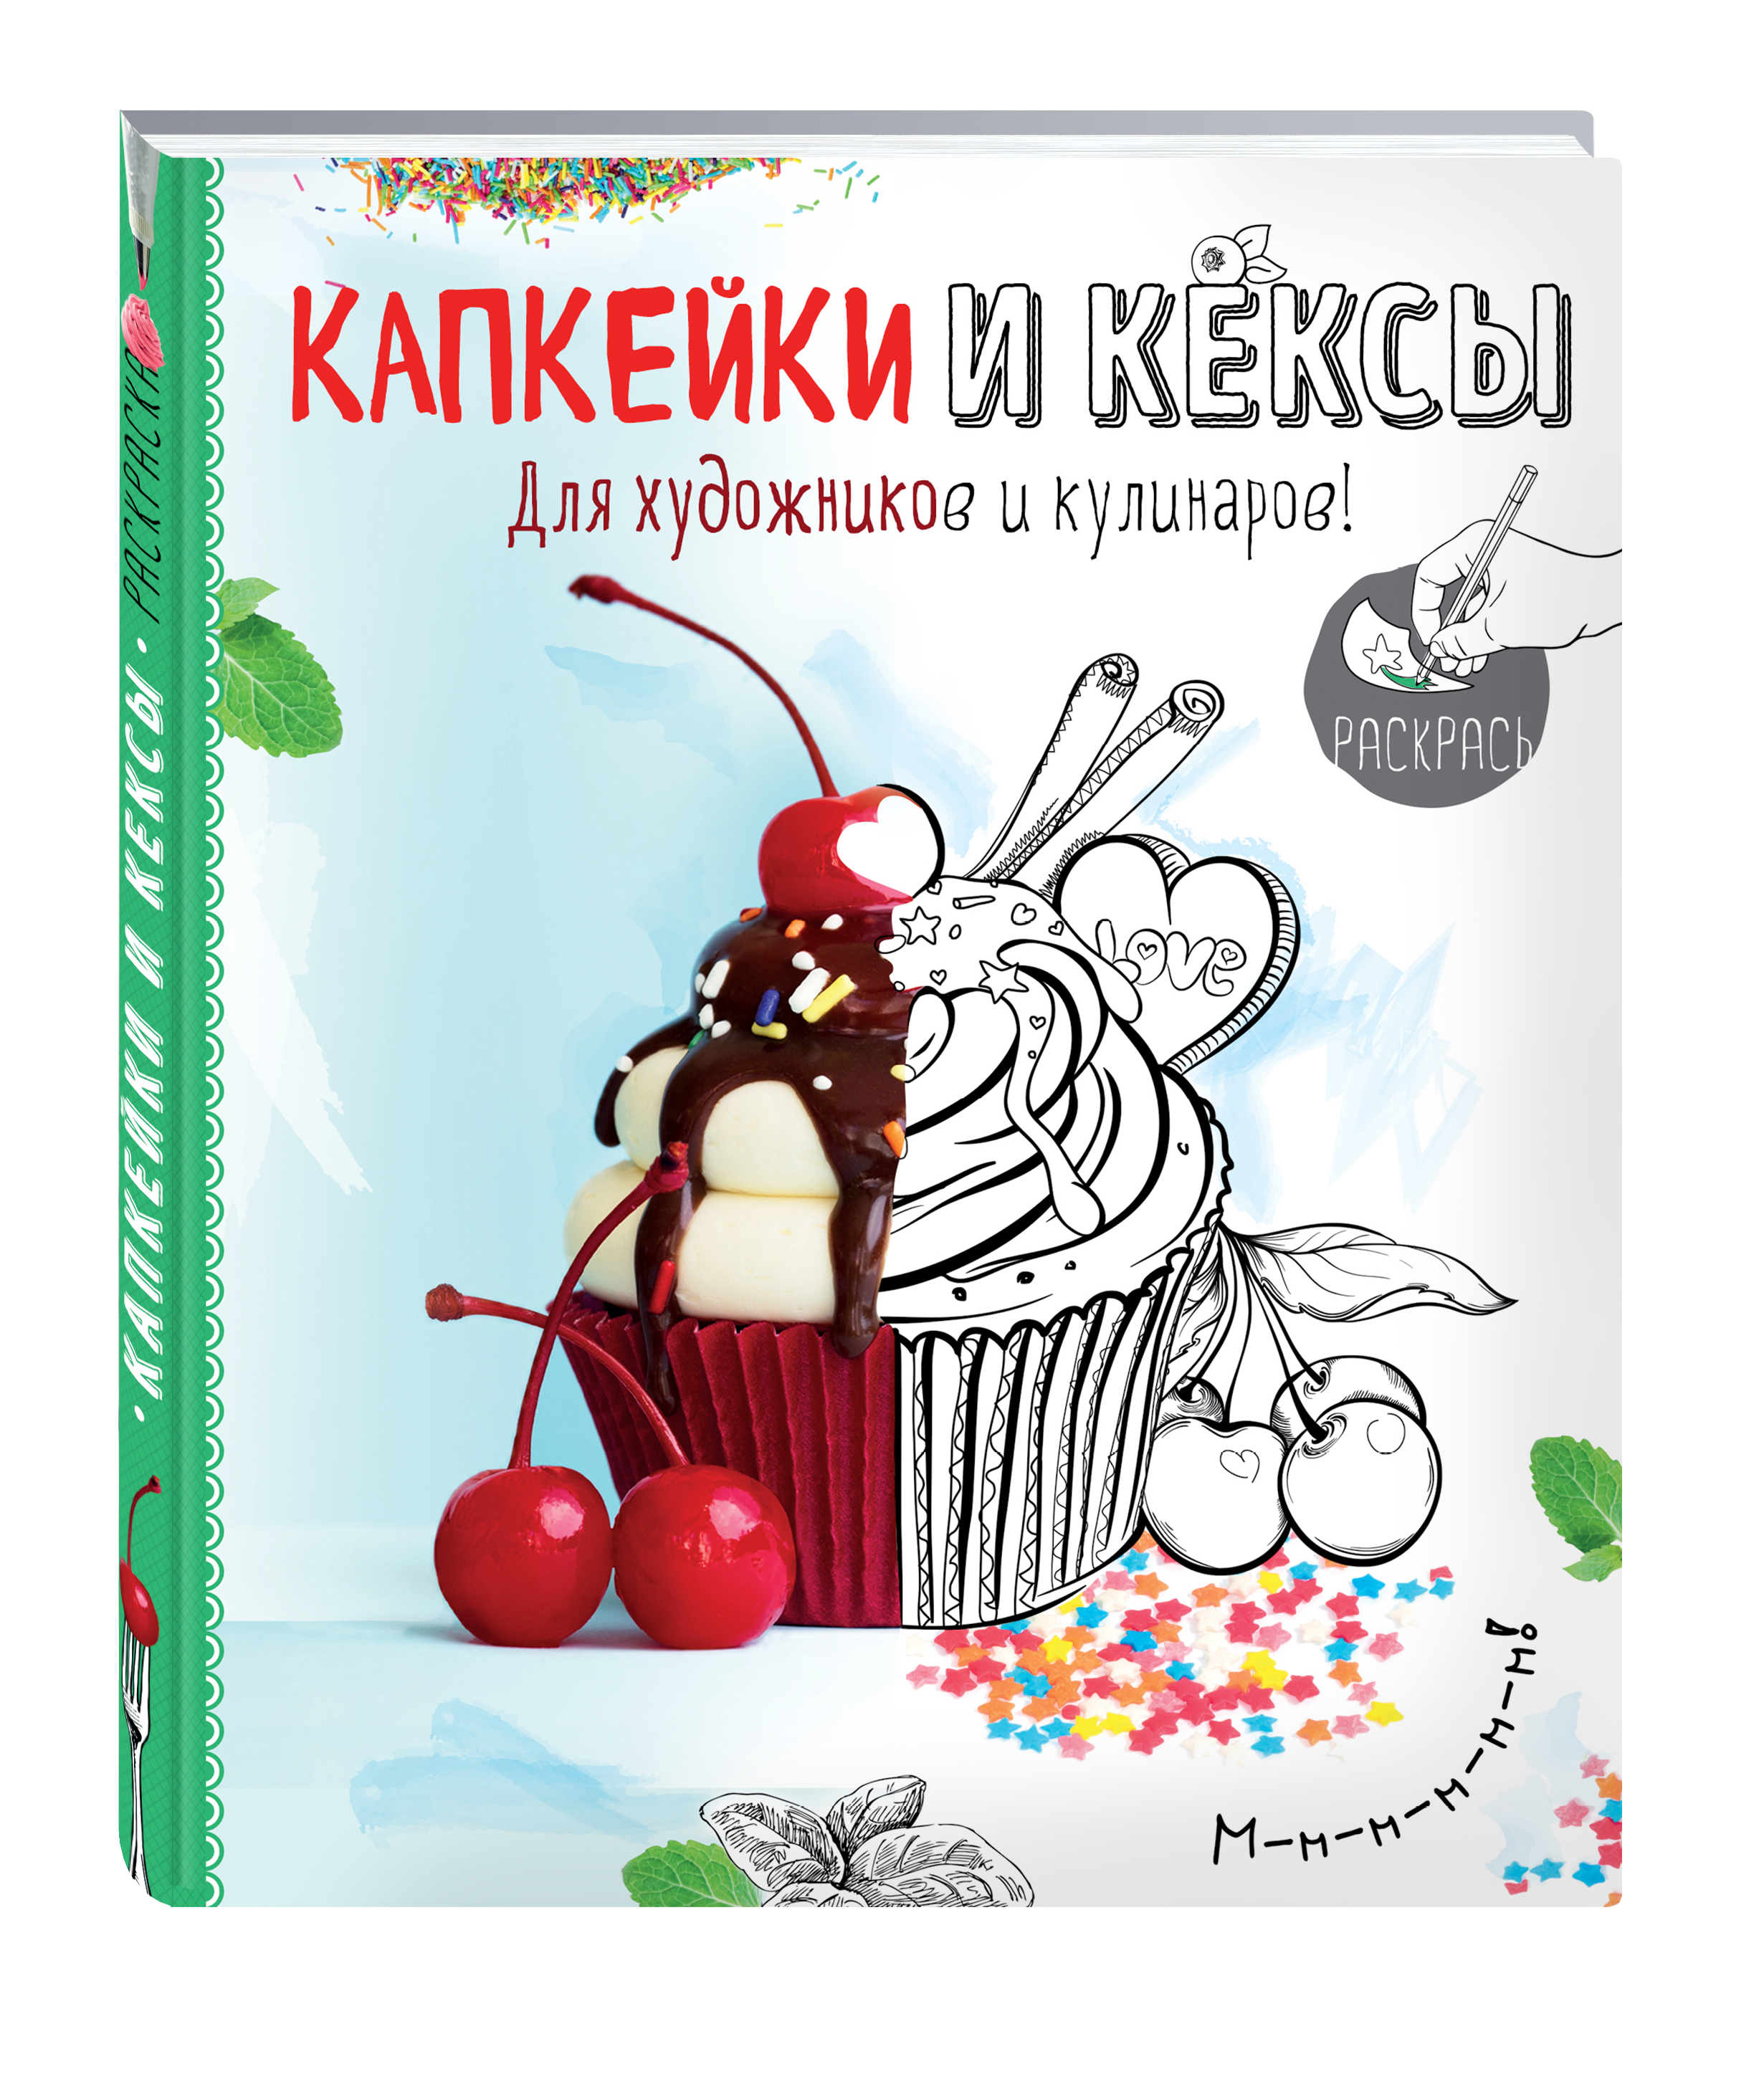 Савинова Н.А., Серебрякова Н.Э. Раскраска. Капкейки и кексы